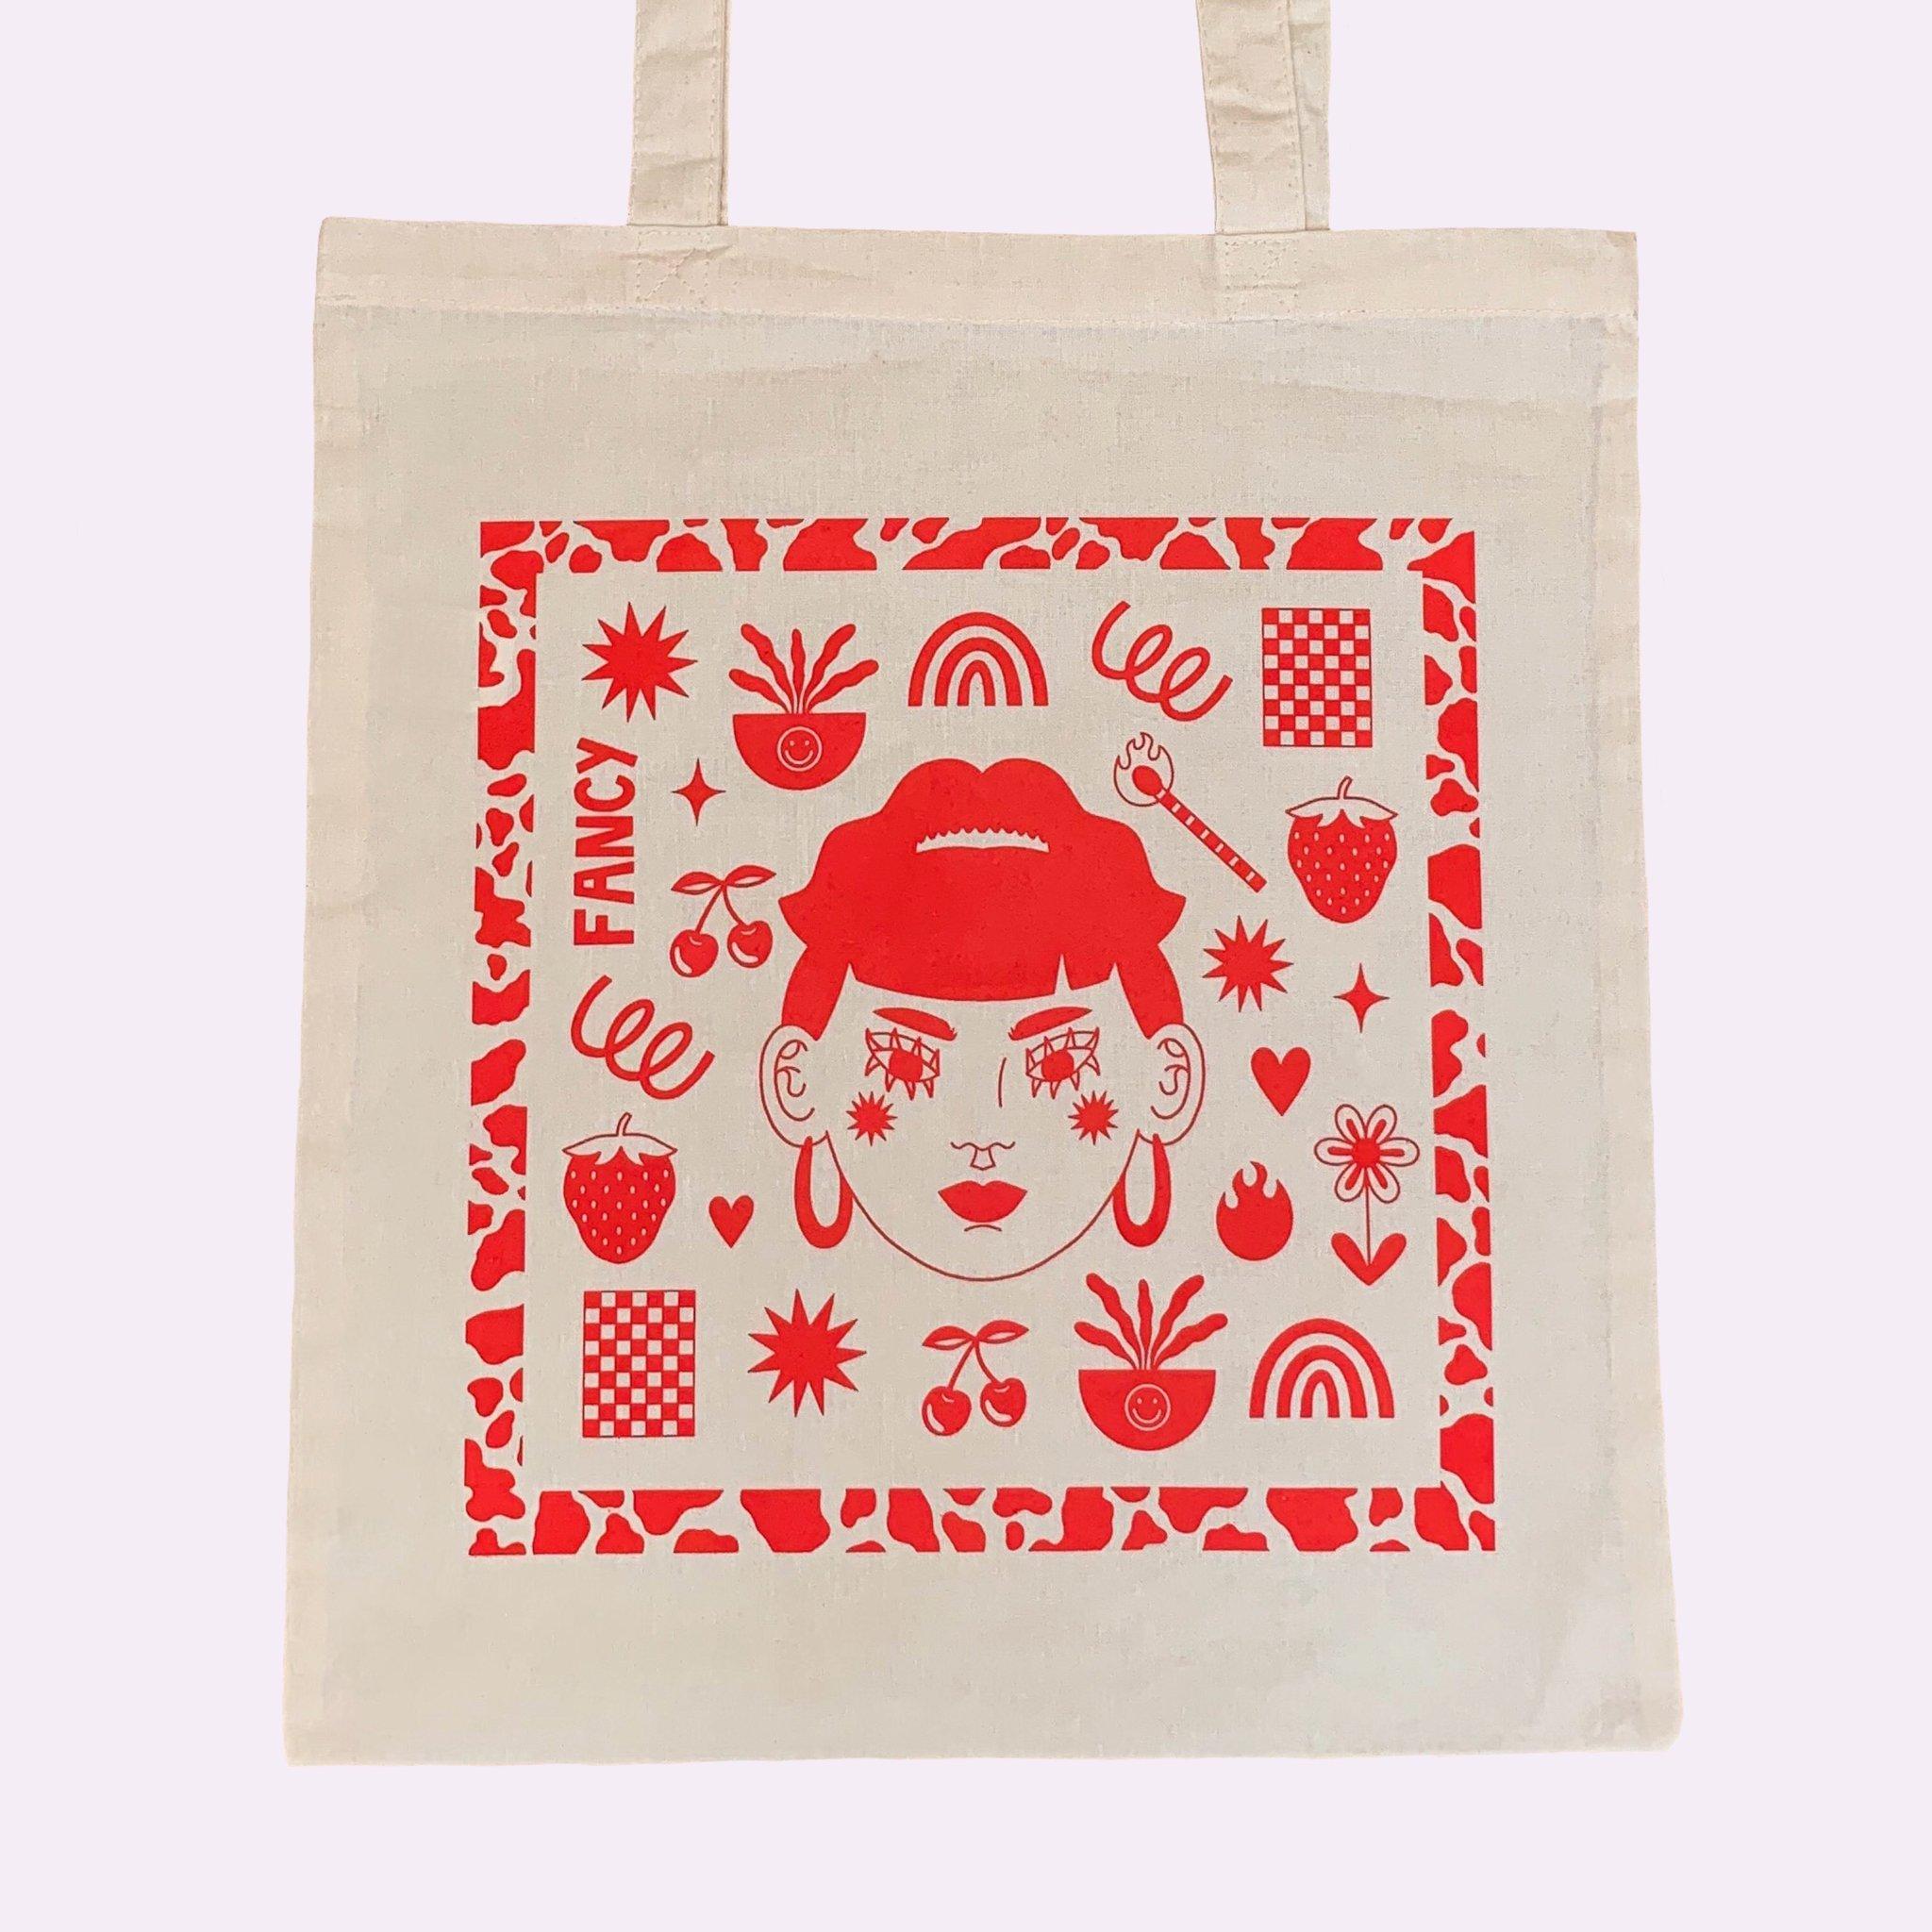 Eva Malley Illustration - Tote Bag